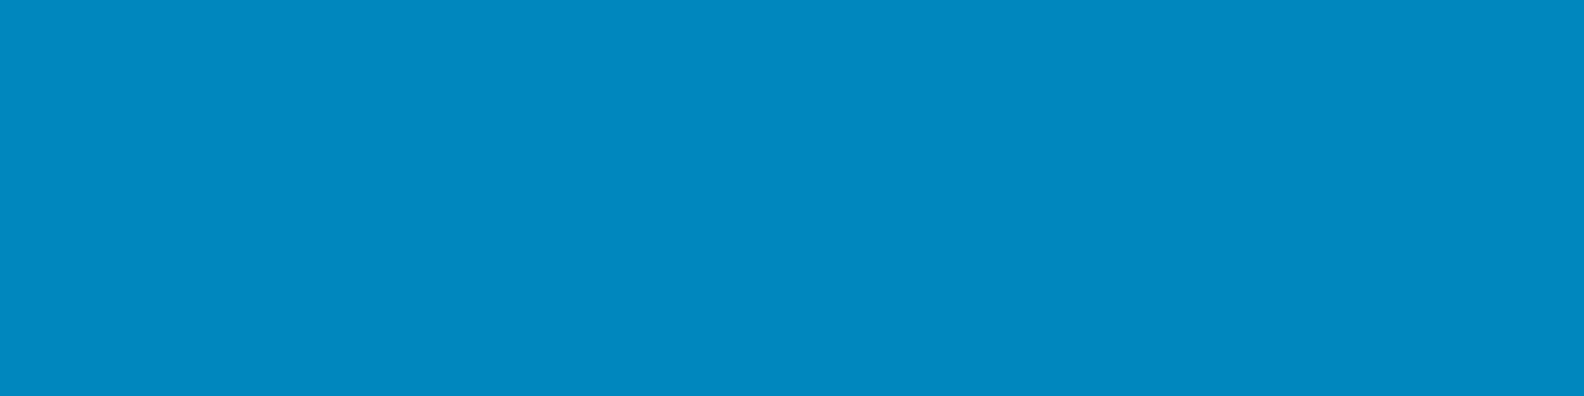 1584x396 Blue NCS Solid Color Background